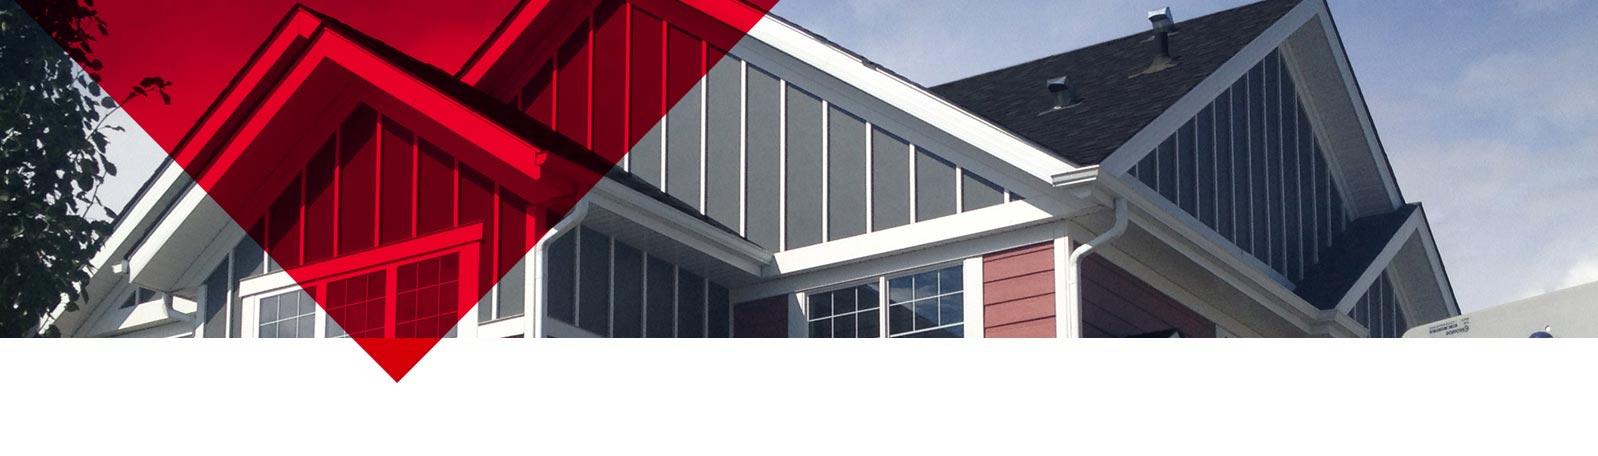 Gutters & Eavestrough Installation & Repair Companies Calgary